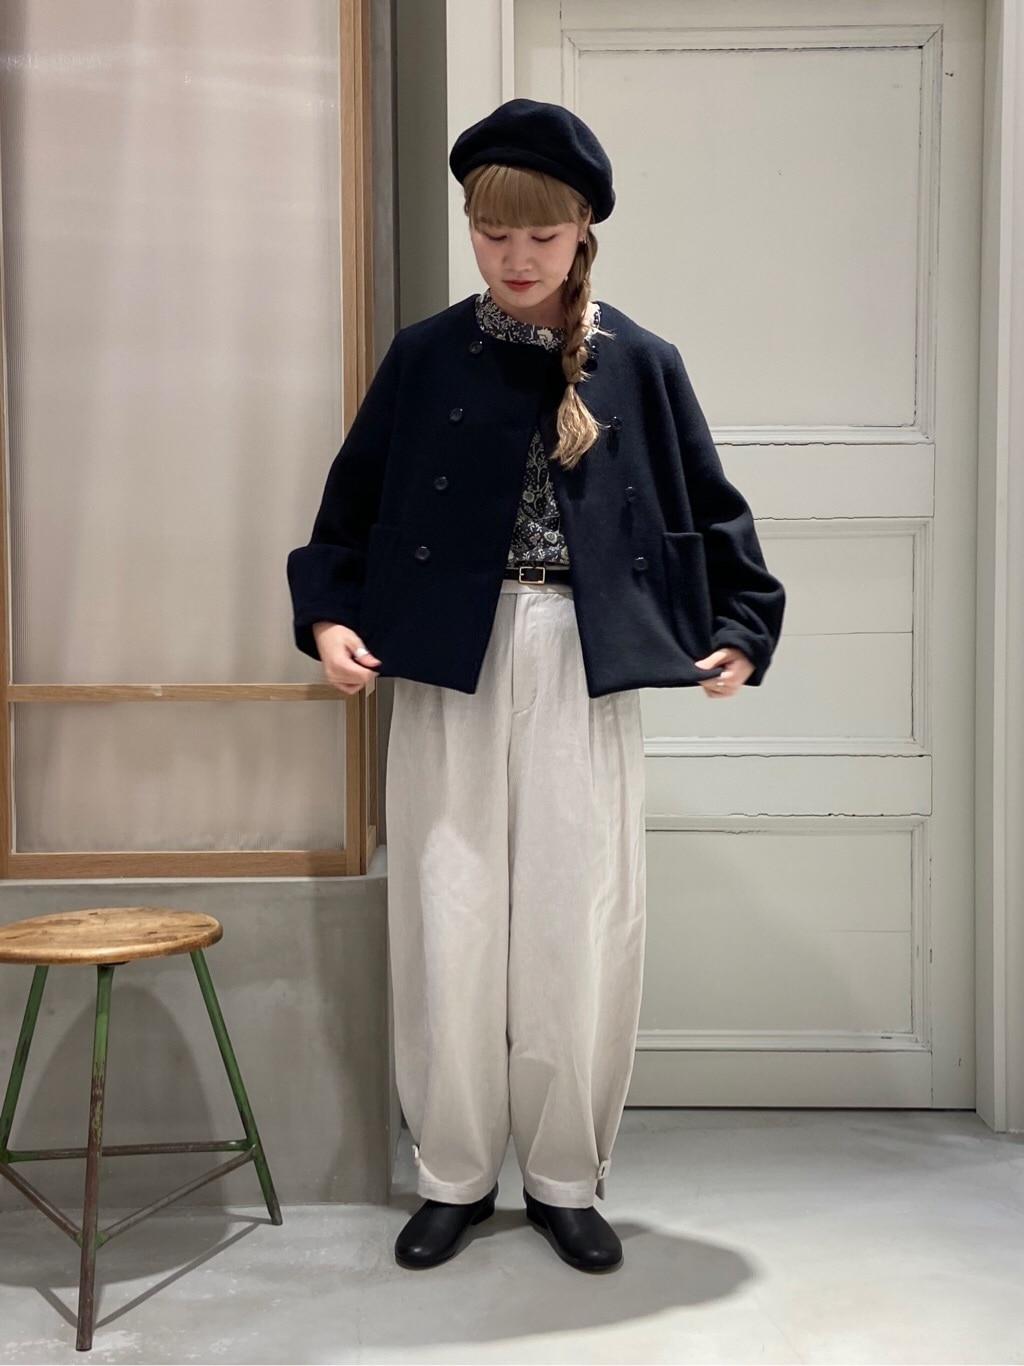 bulle de savon 渋谷スクランブルスクエア 身長:160cm 2020.10.27